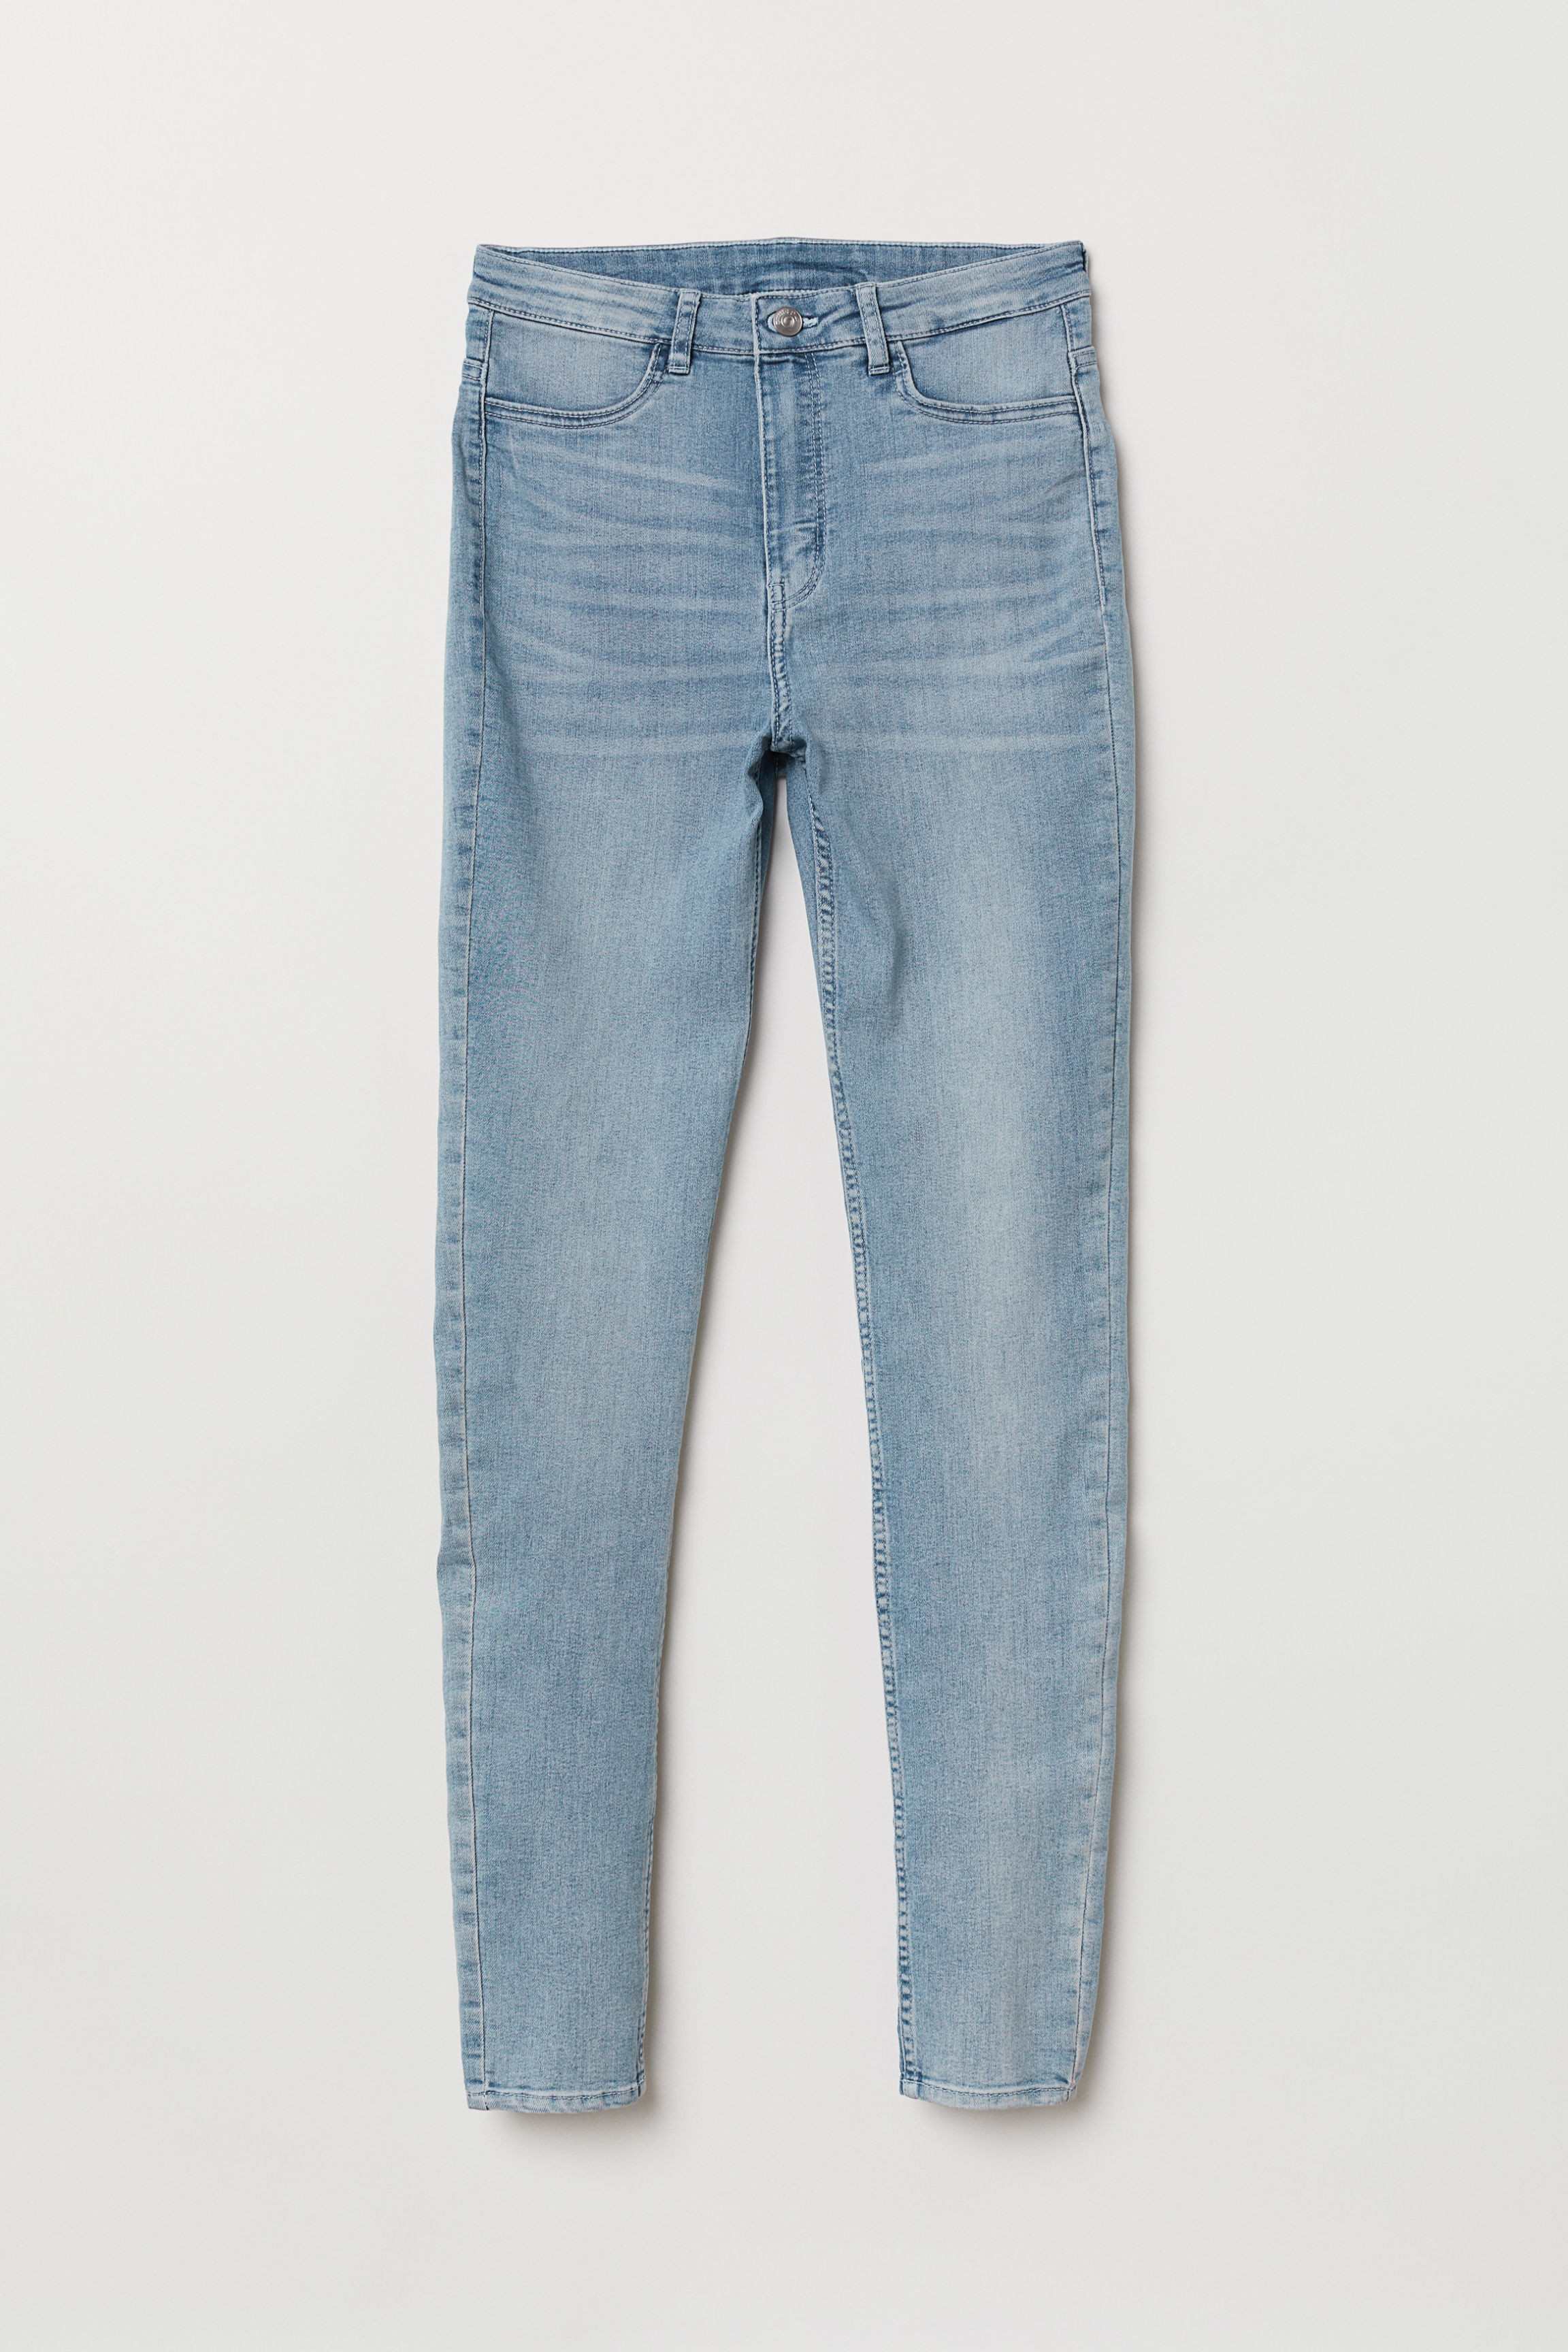 classic styles popular brand enjoy best price Super Skinny High Jeans